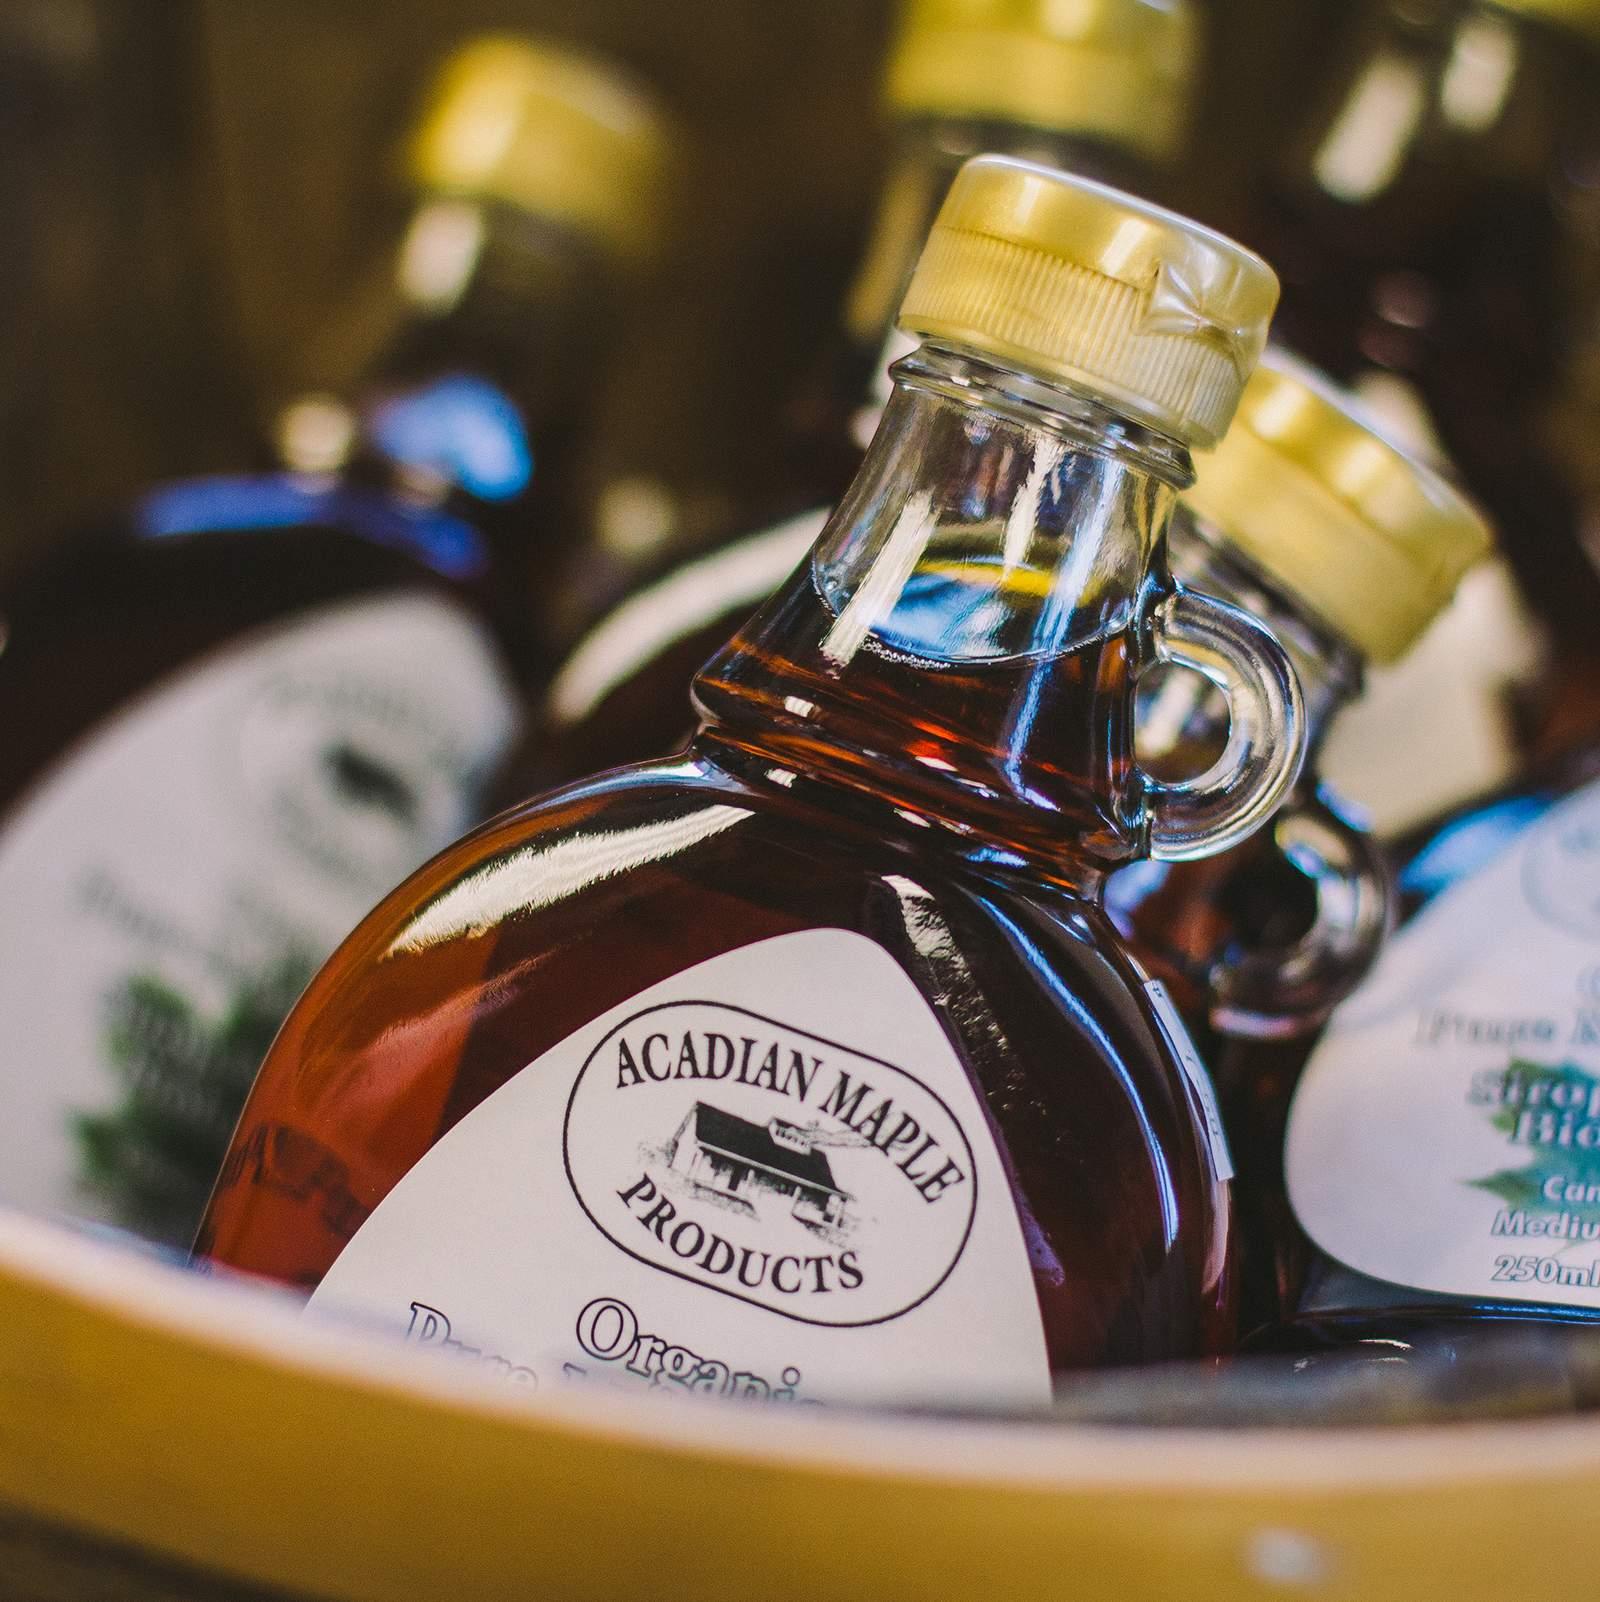 Acadian Maple Sirup